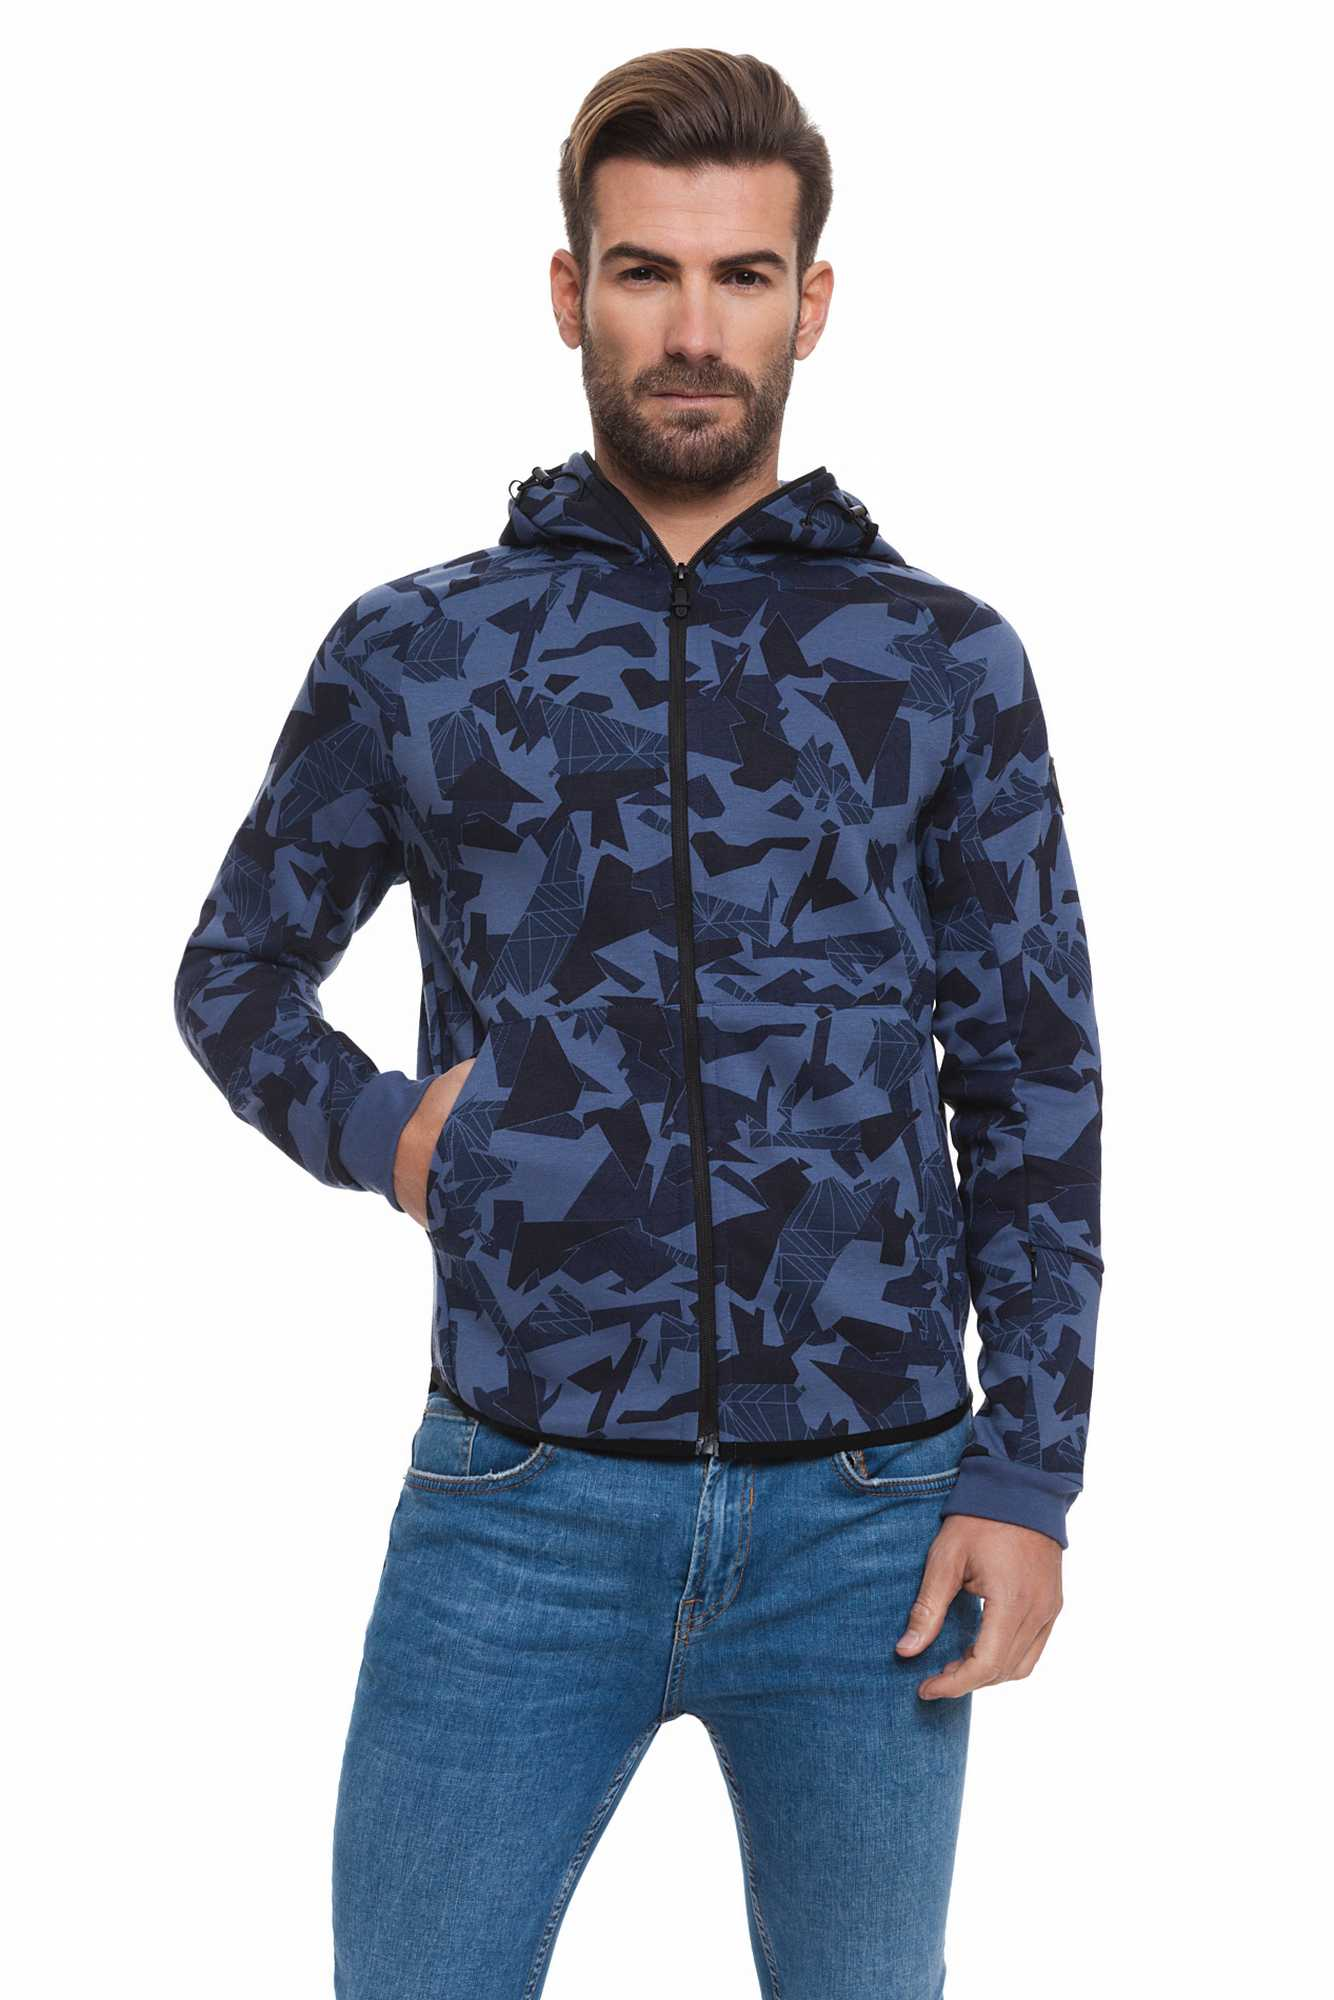 Born богатый балателли свитер для мужчин темно синий спортивный BR2E111087AA2BRC 2